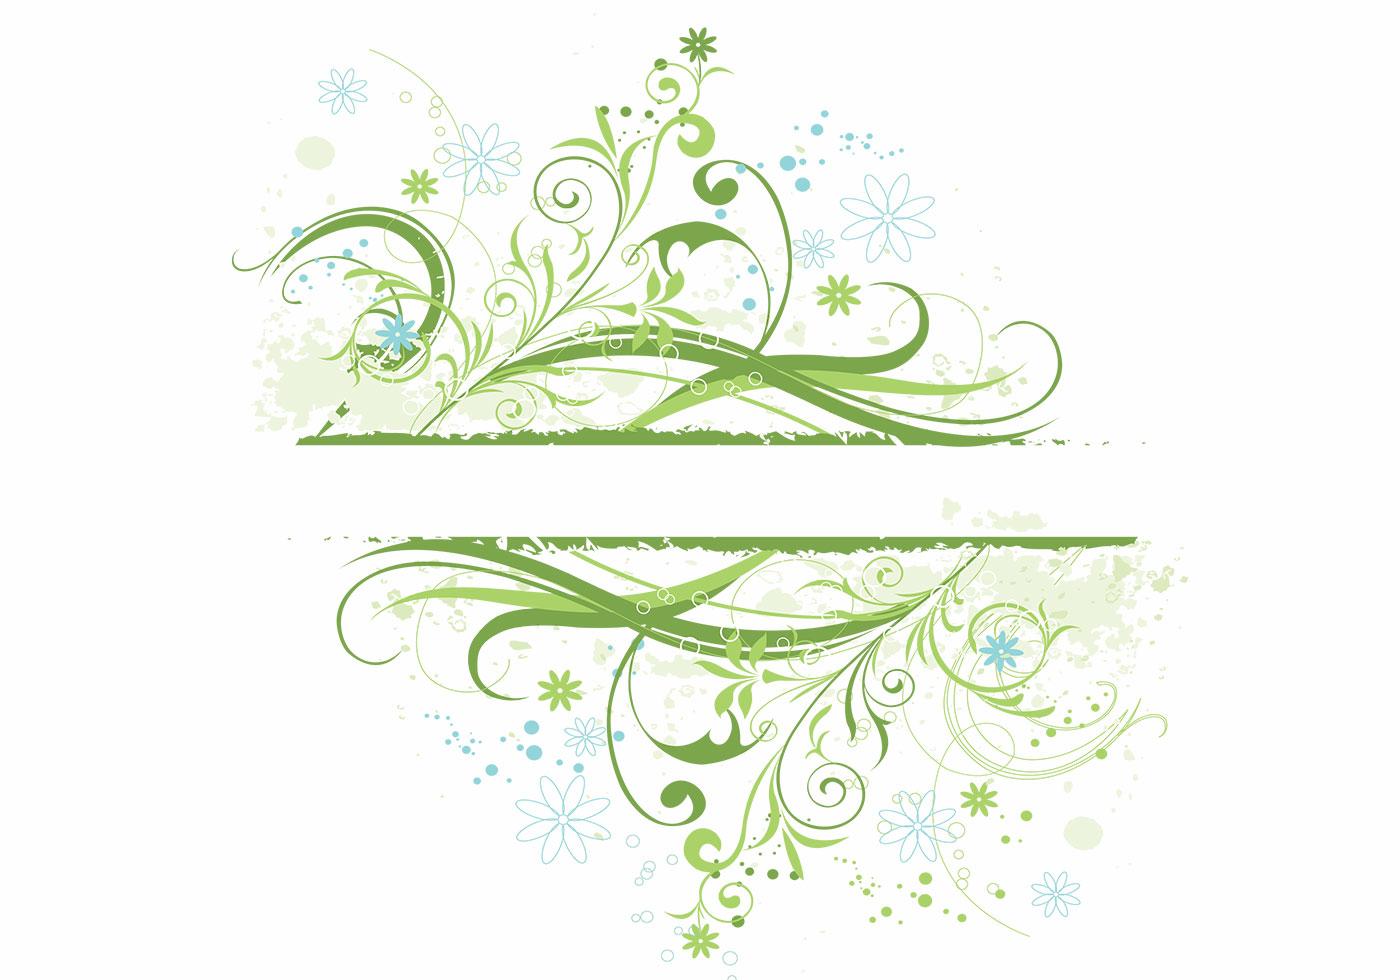 Floral Grunge Background Vector - Download Free Vectors ...